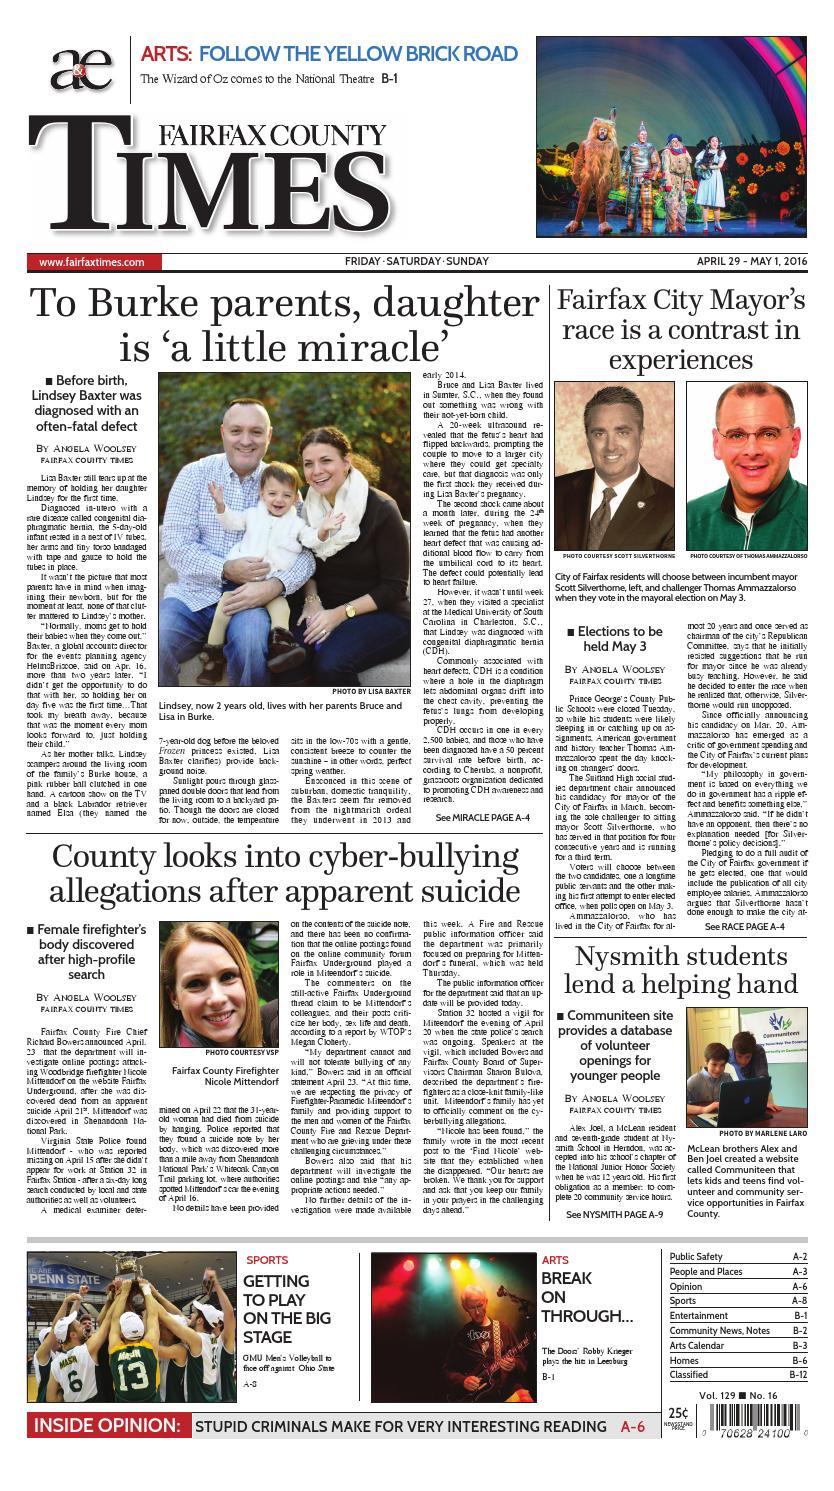 Fairfax County Times 04-29-16 by The Fairfax Times - Issuu